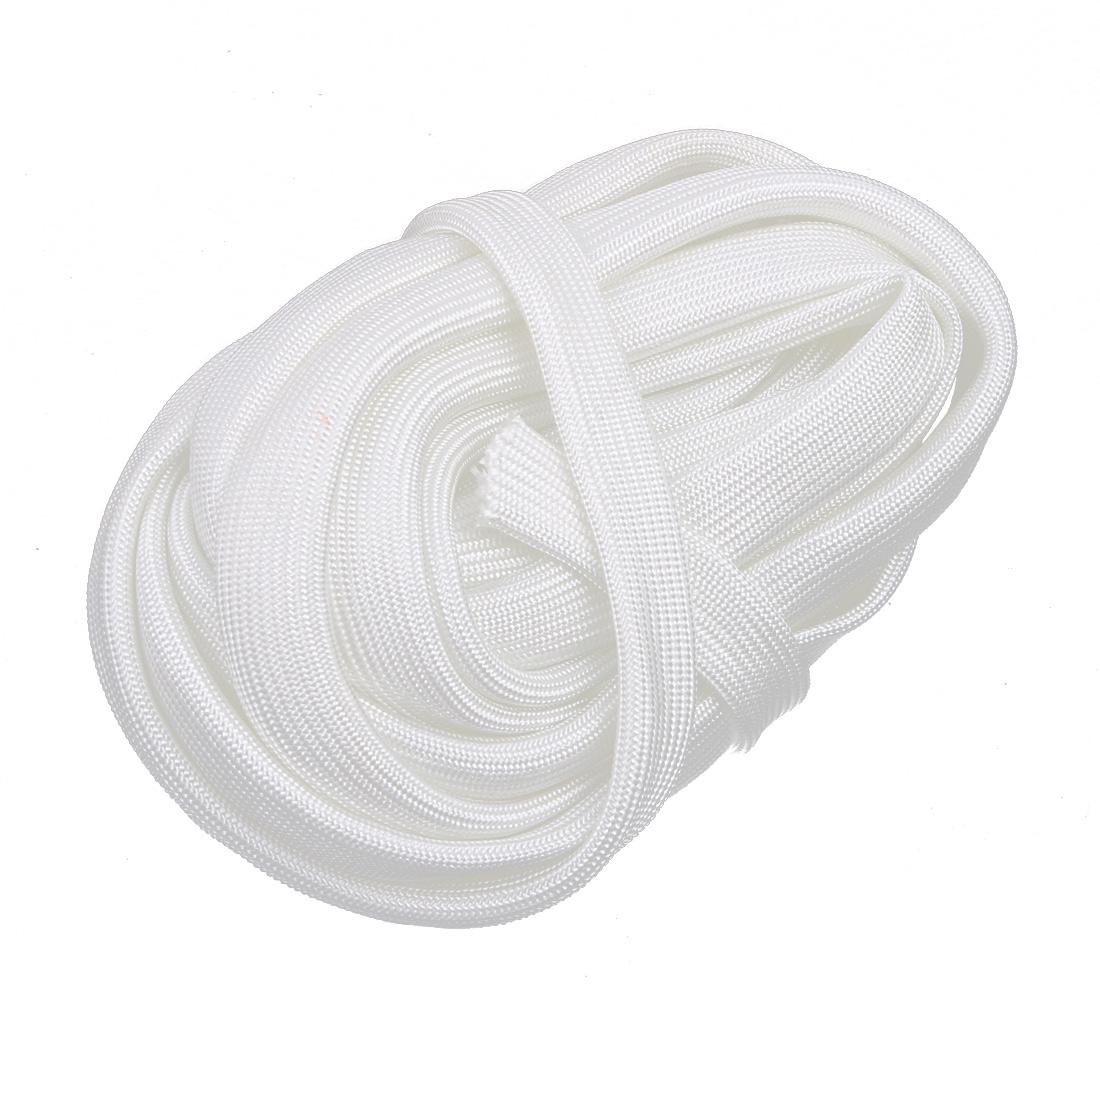 White 600C Temp Resistance Fiberglass PVC Insulation Sleeve 5M Long 10mm Dia